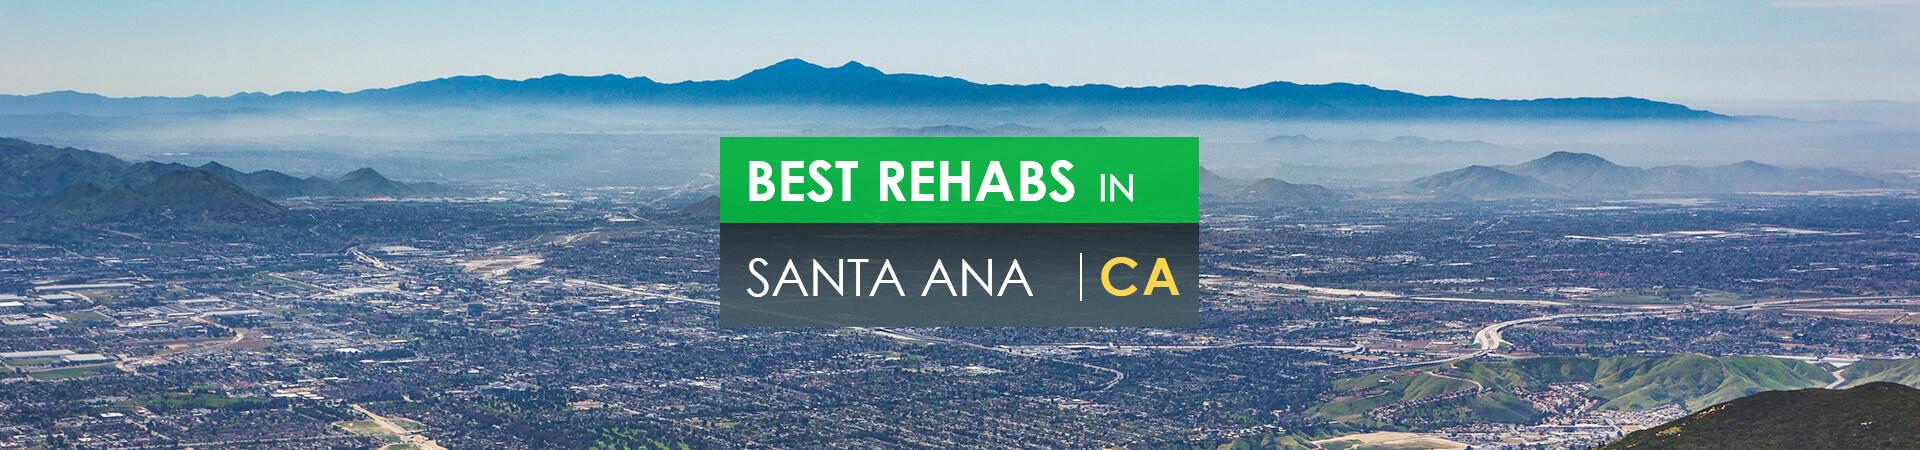 Best rehabs in Santa Ana, CA